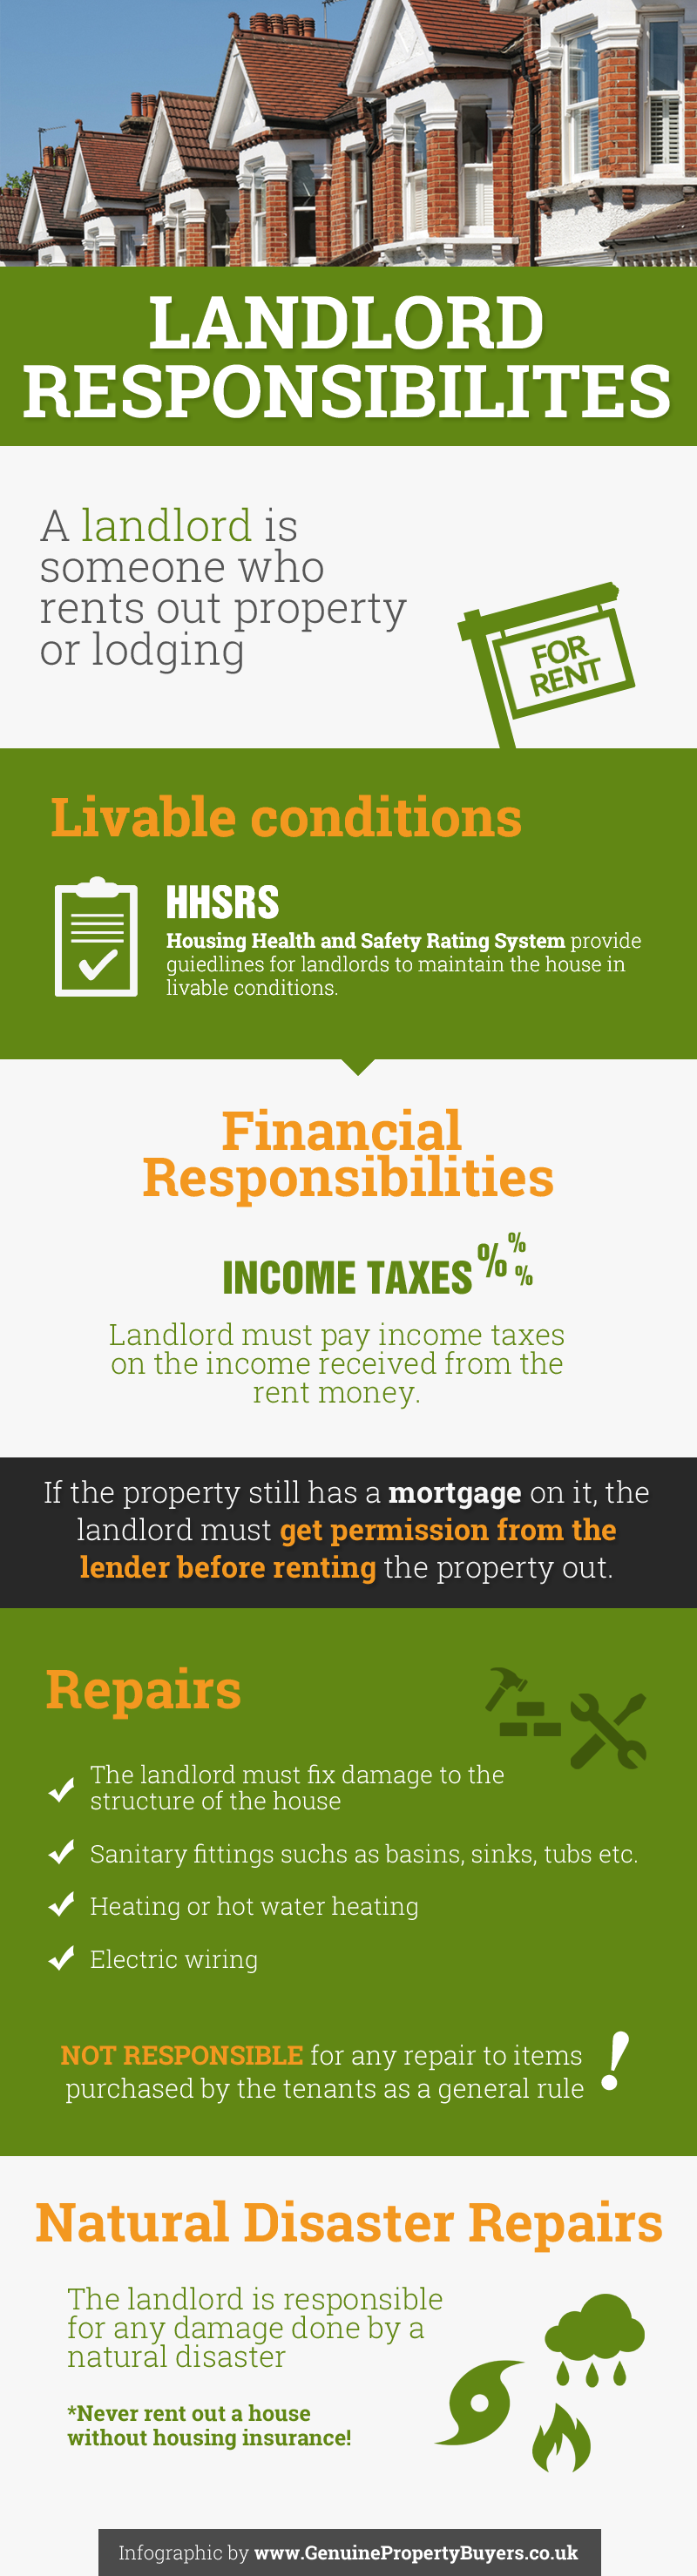 3-landlord-responsibilities-infographic